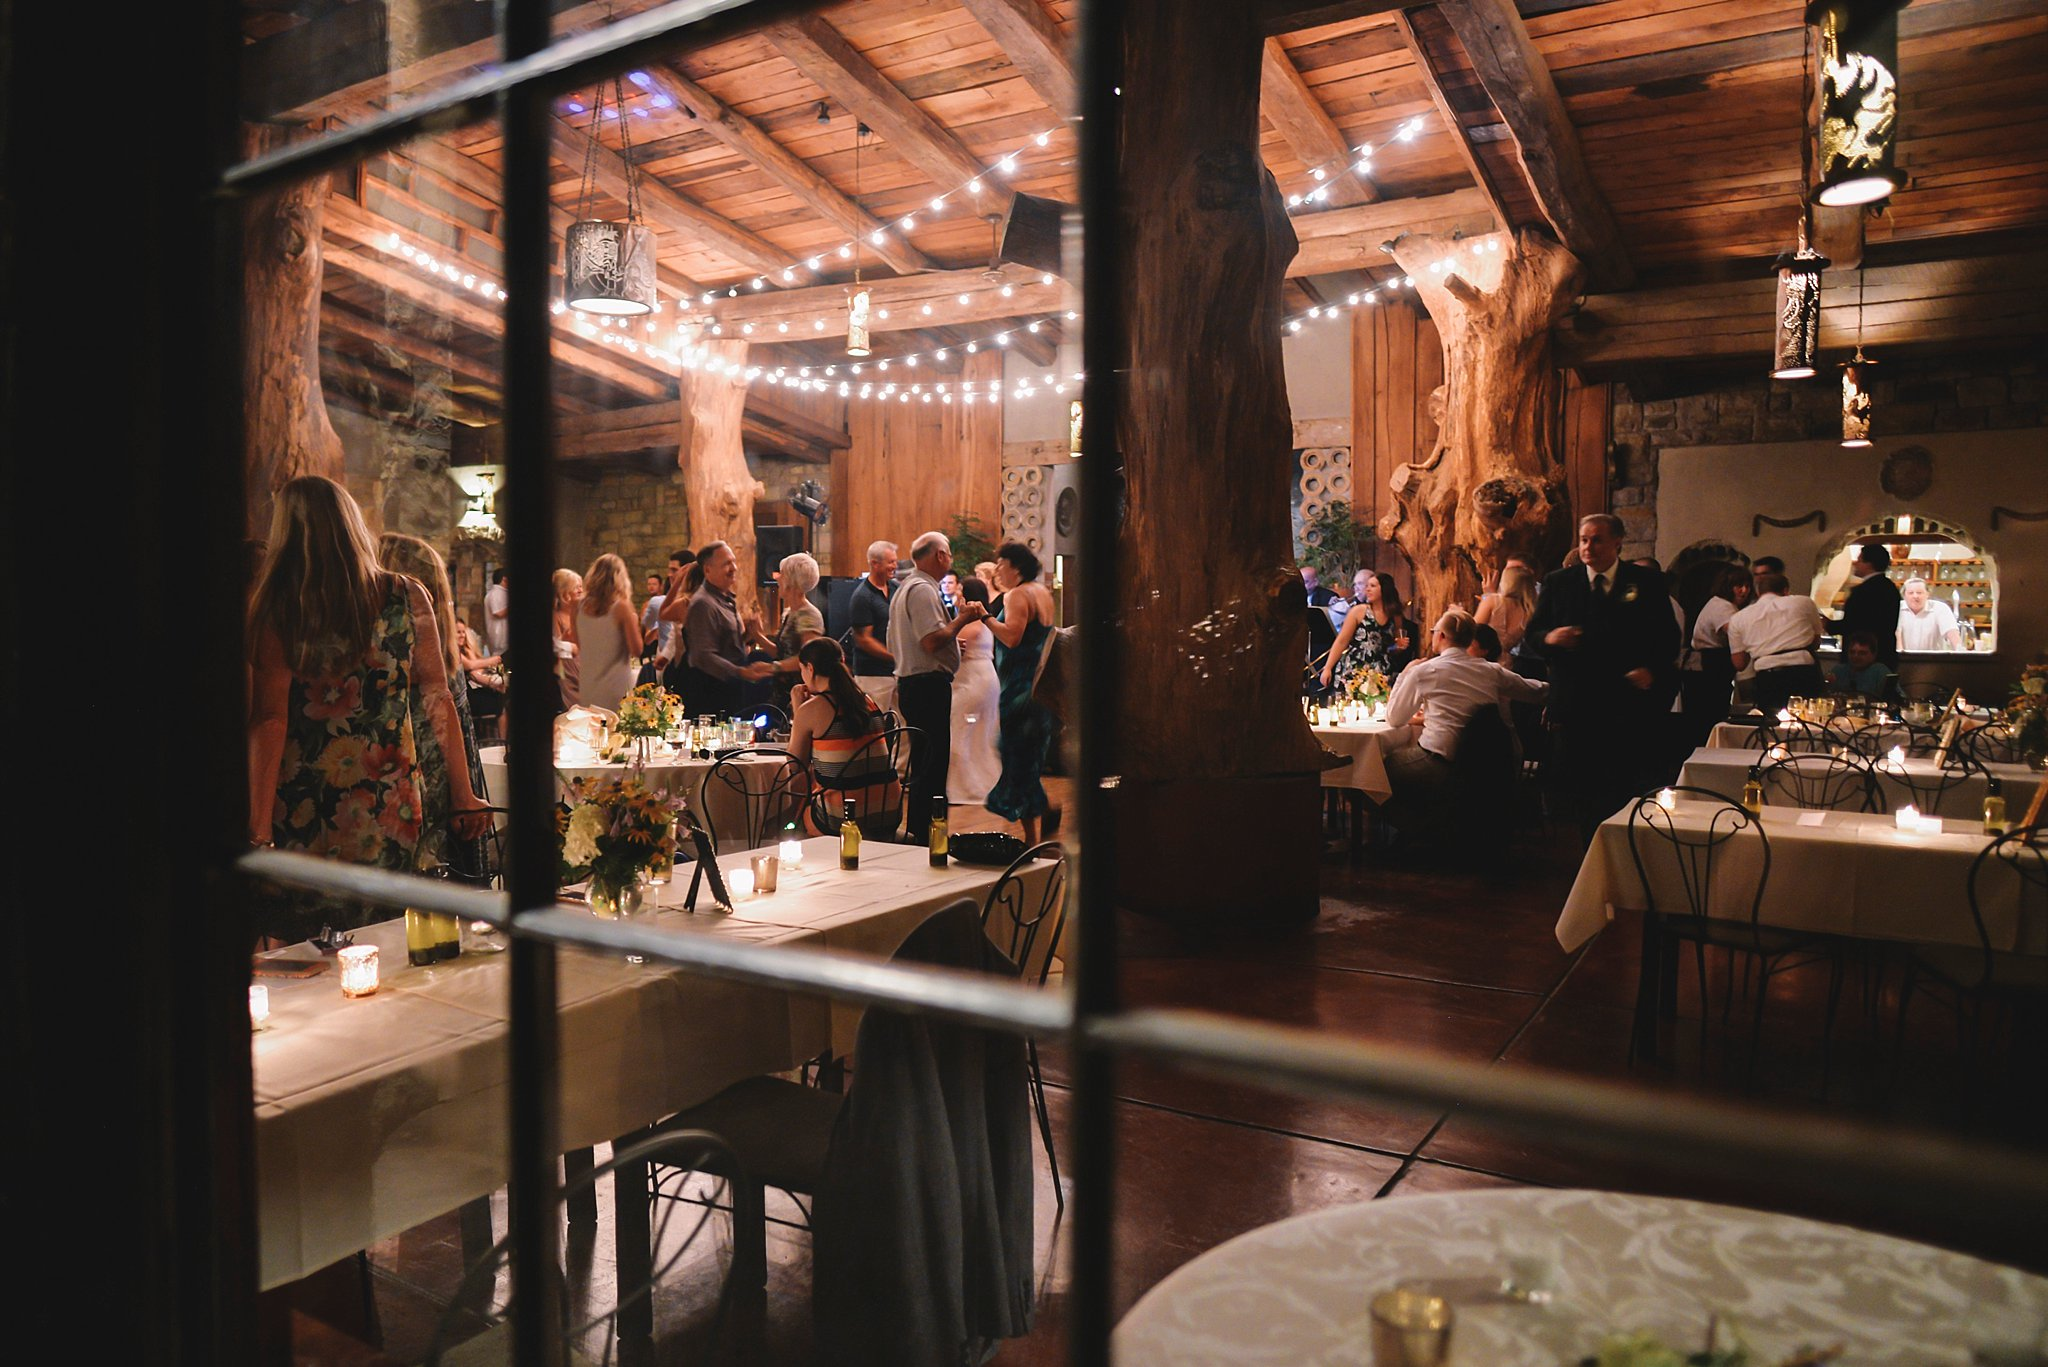 Wedding photographer- Sandrachile